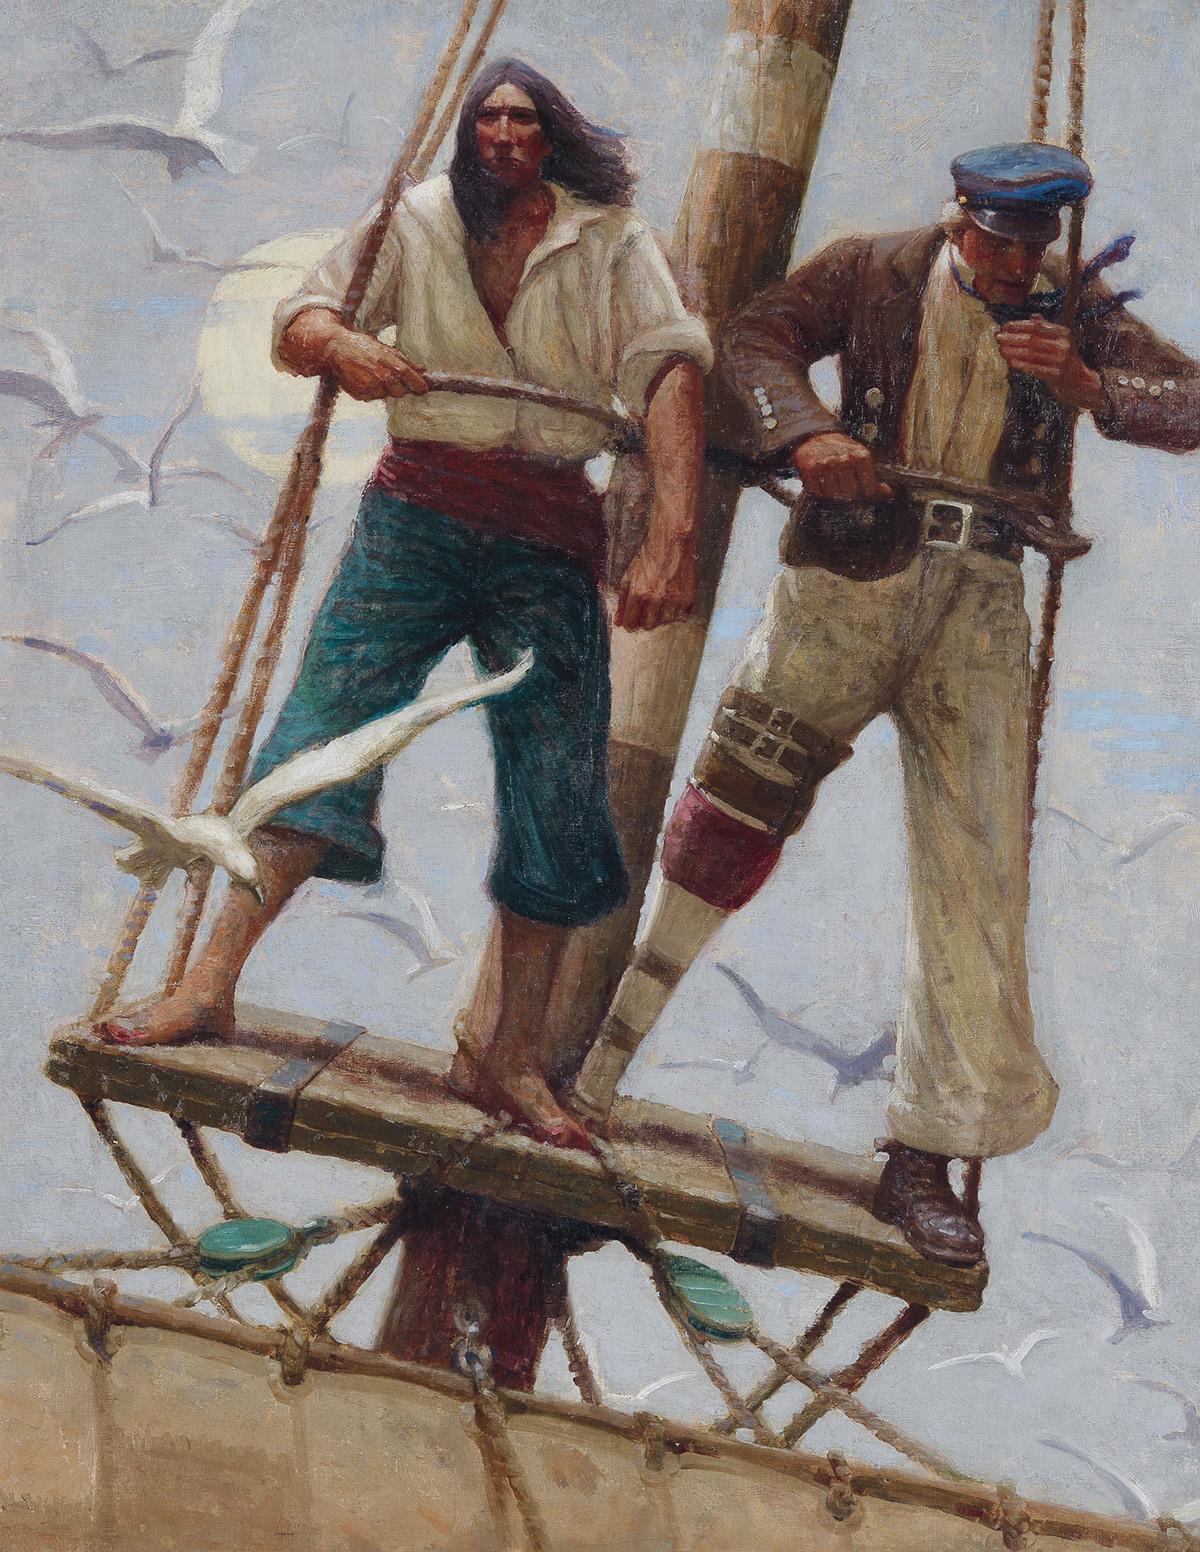 MEAD-SCHAEFFER-(MOBY-DICK--MELVILLE--AMERICAN-ART)-He-raised